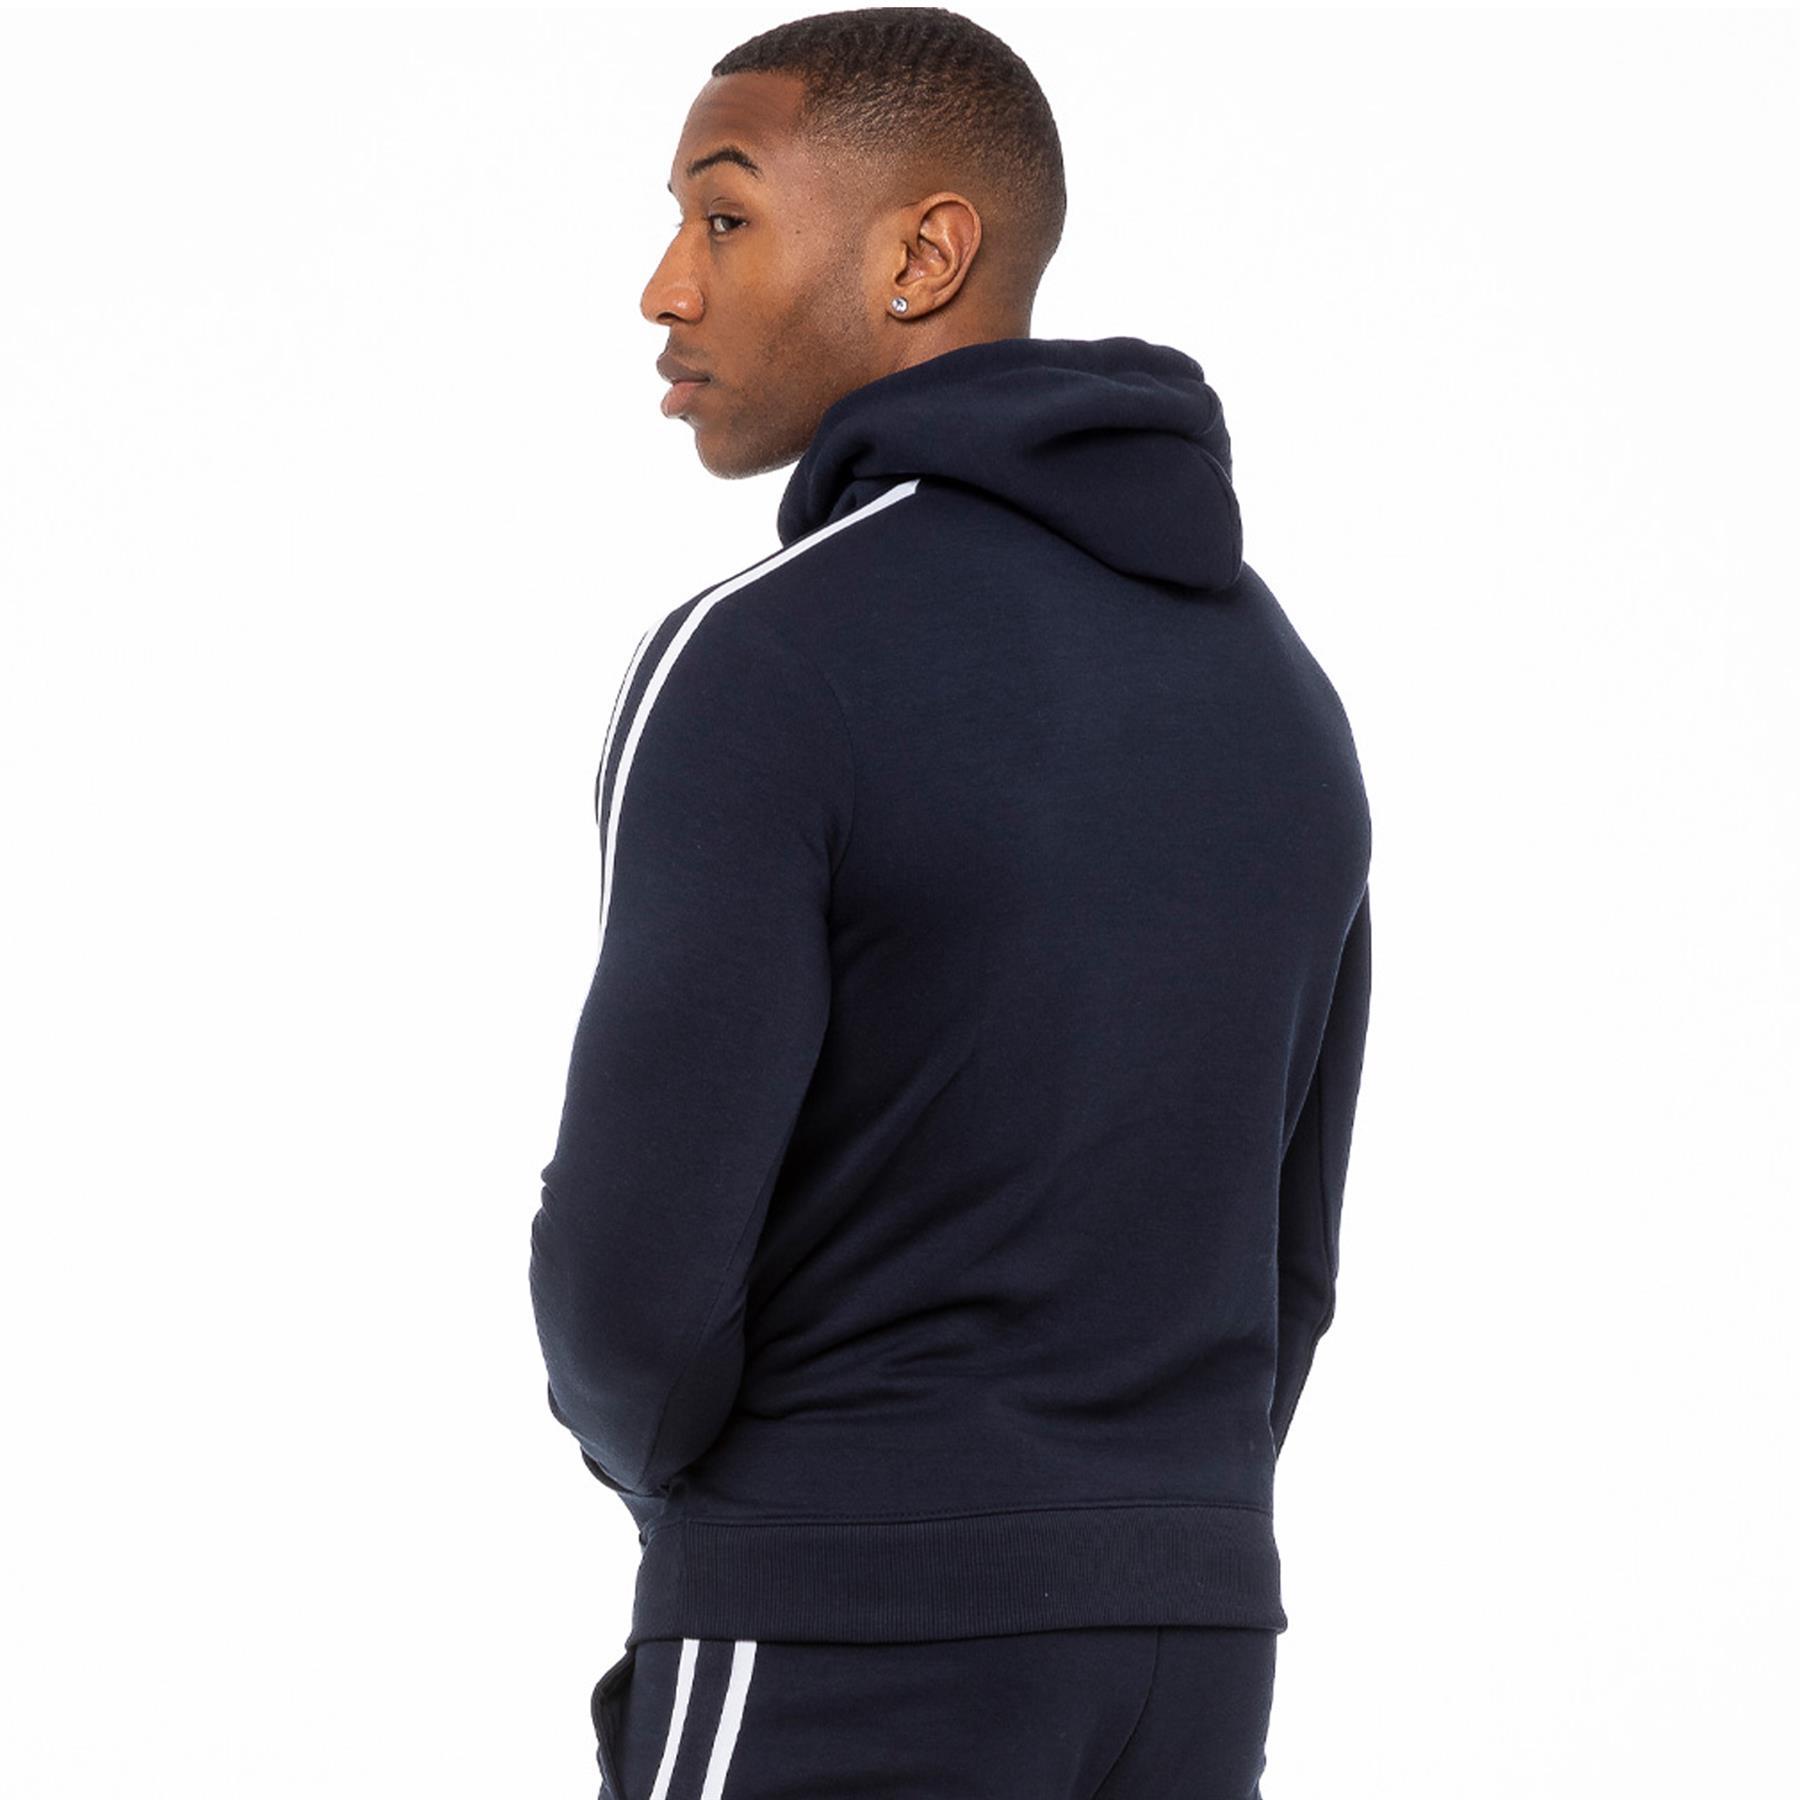 thumbnail 36 - Enzo Mens Full Tracksuit Set Pullover Hoodie Hooded Sweatshirt Joggers Bottoms